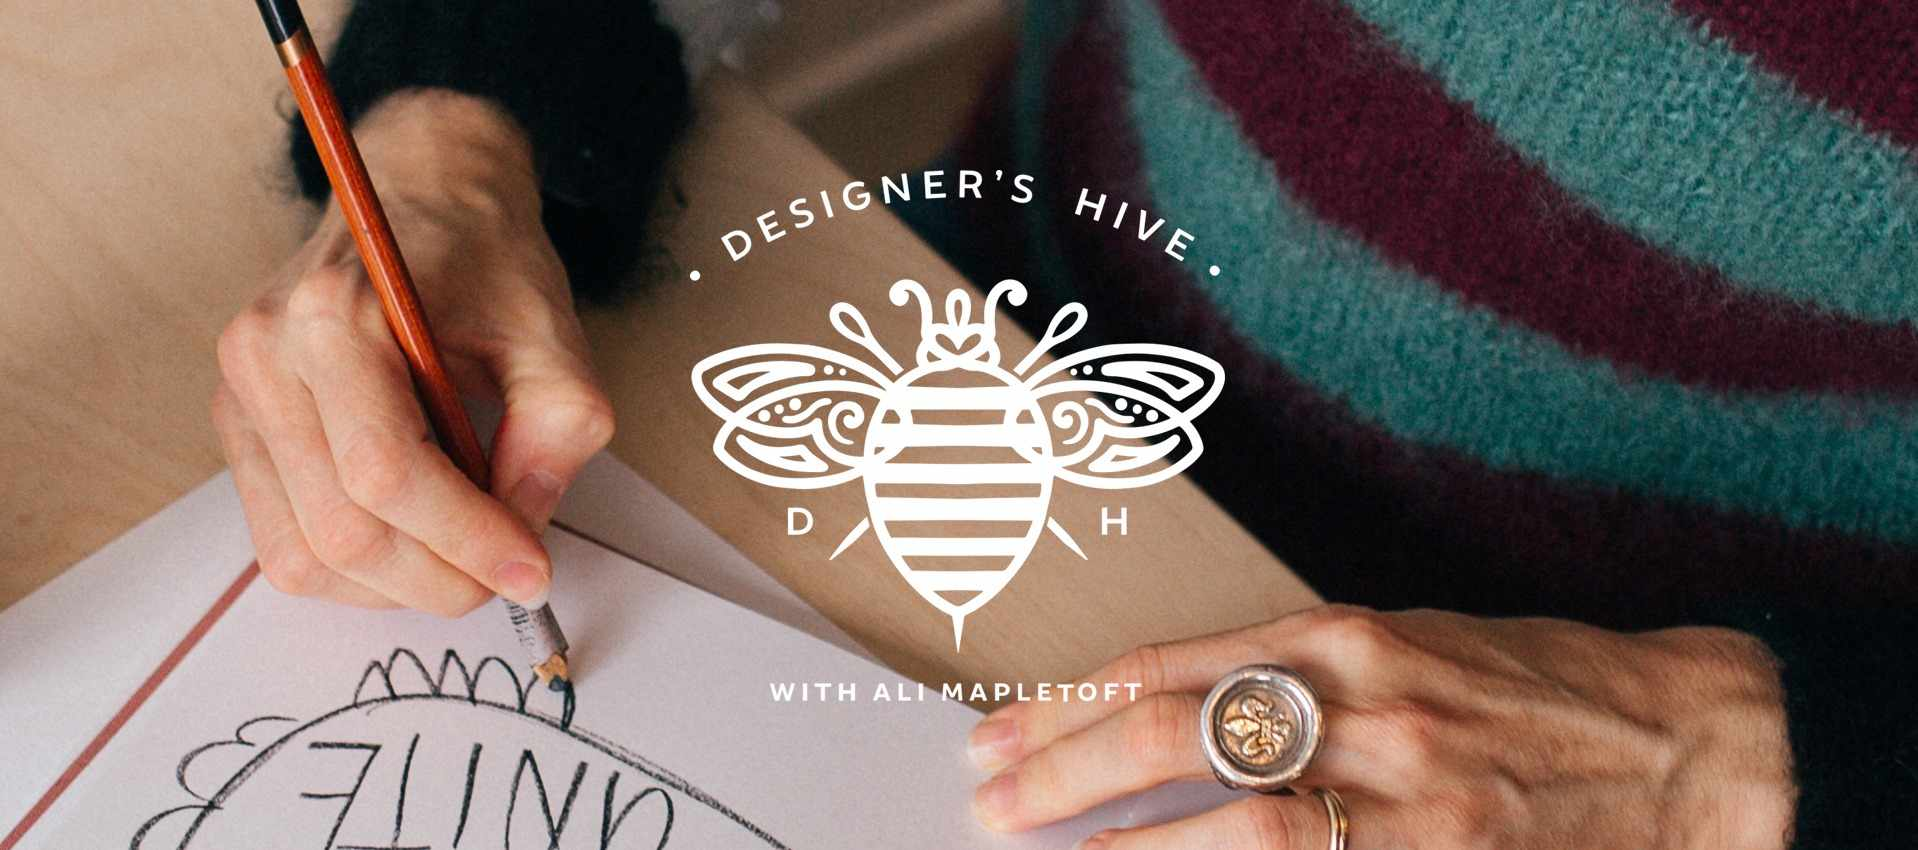 Designer's Hive